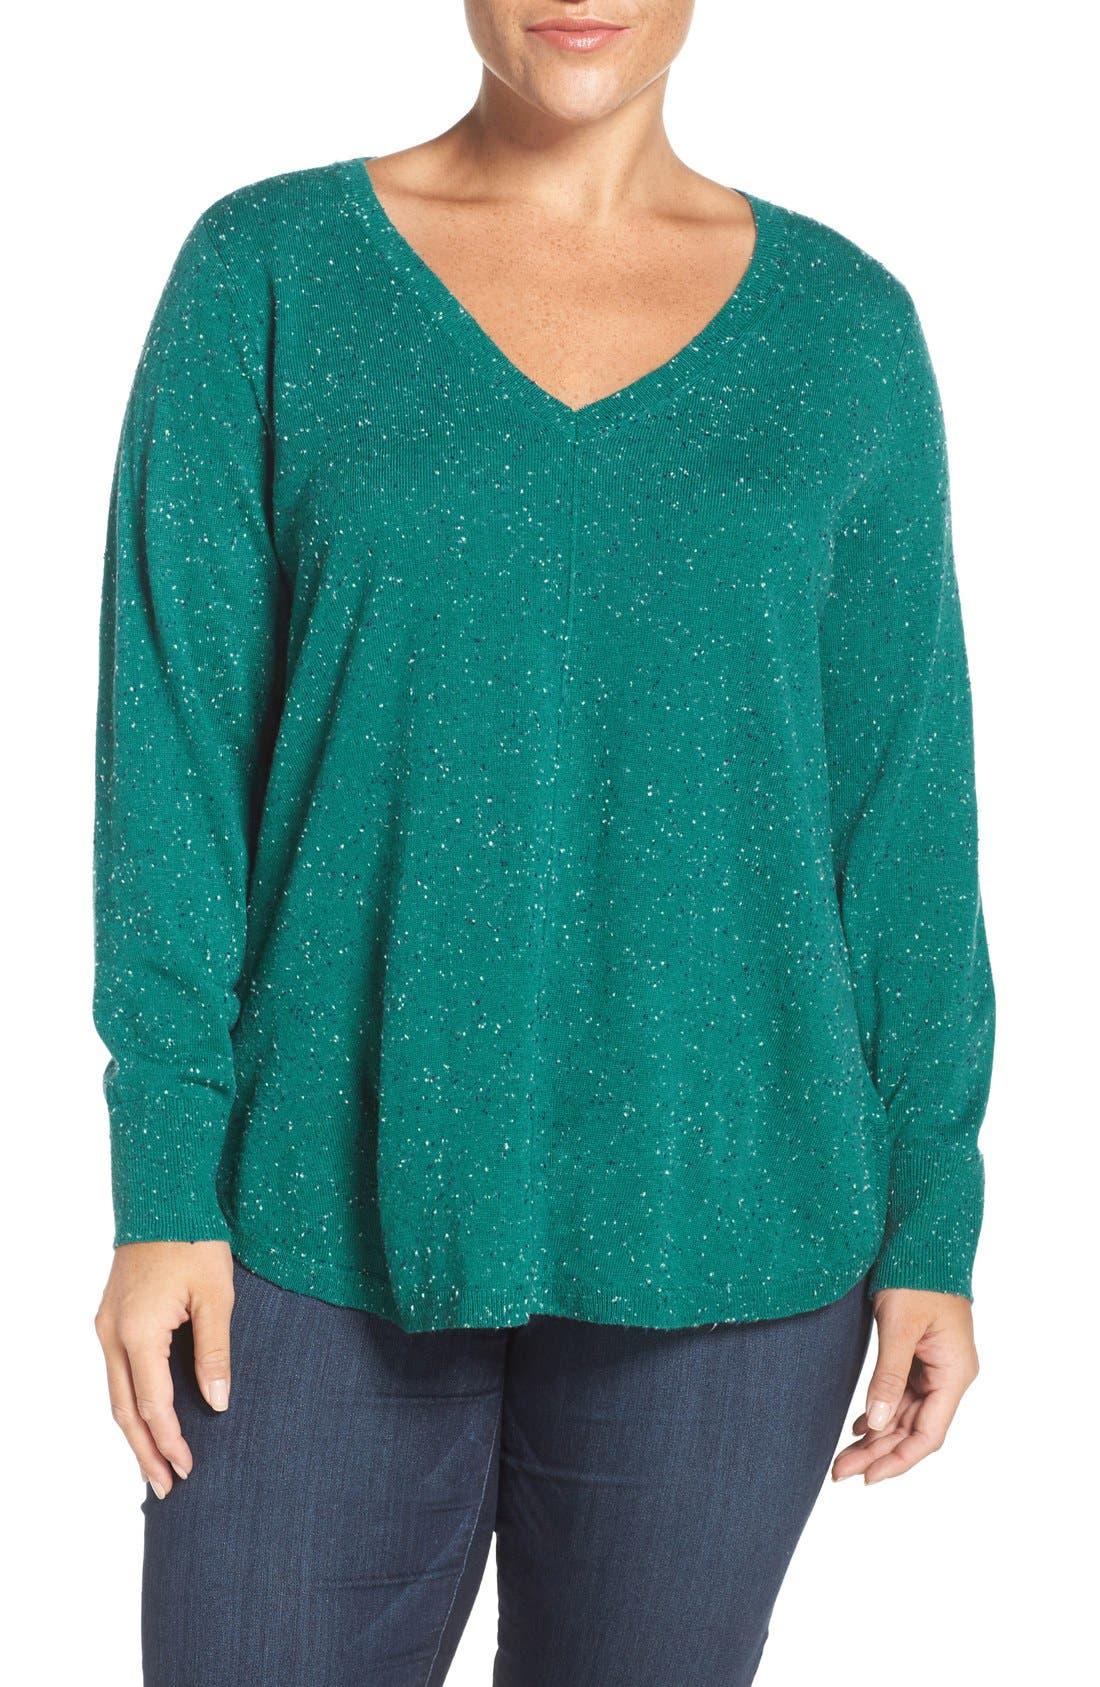 Alternate Image 1 Selected - Caslon® Marled V-Neck Sweater (Plus Size)